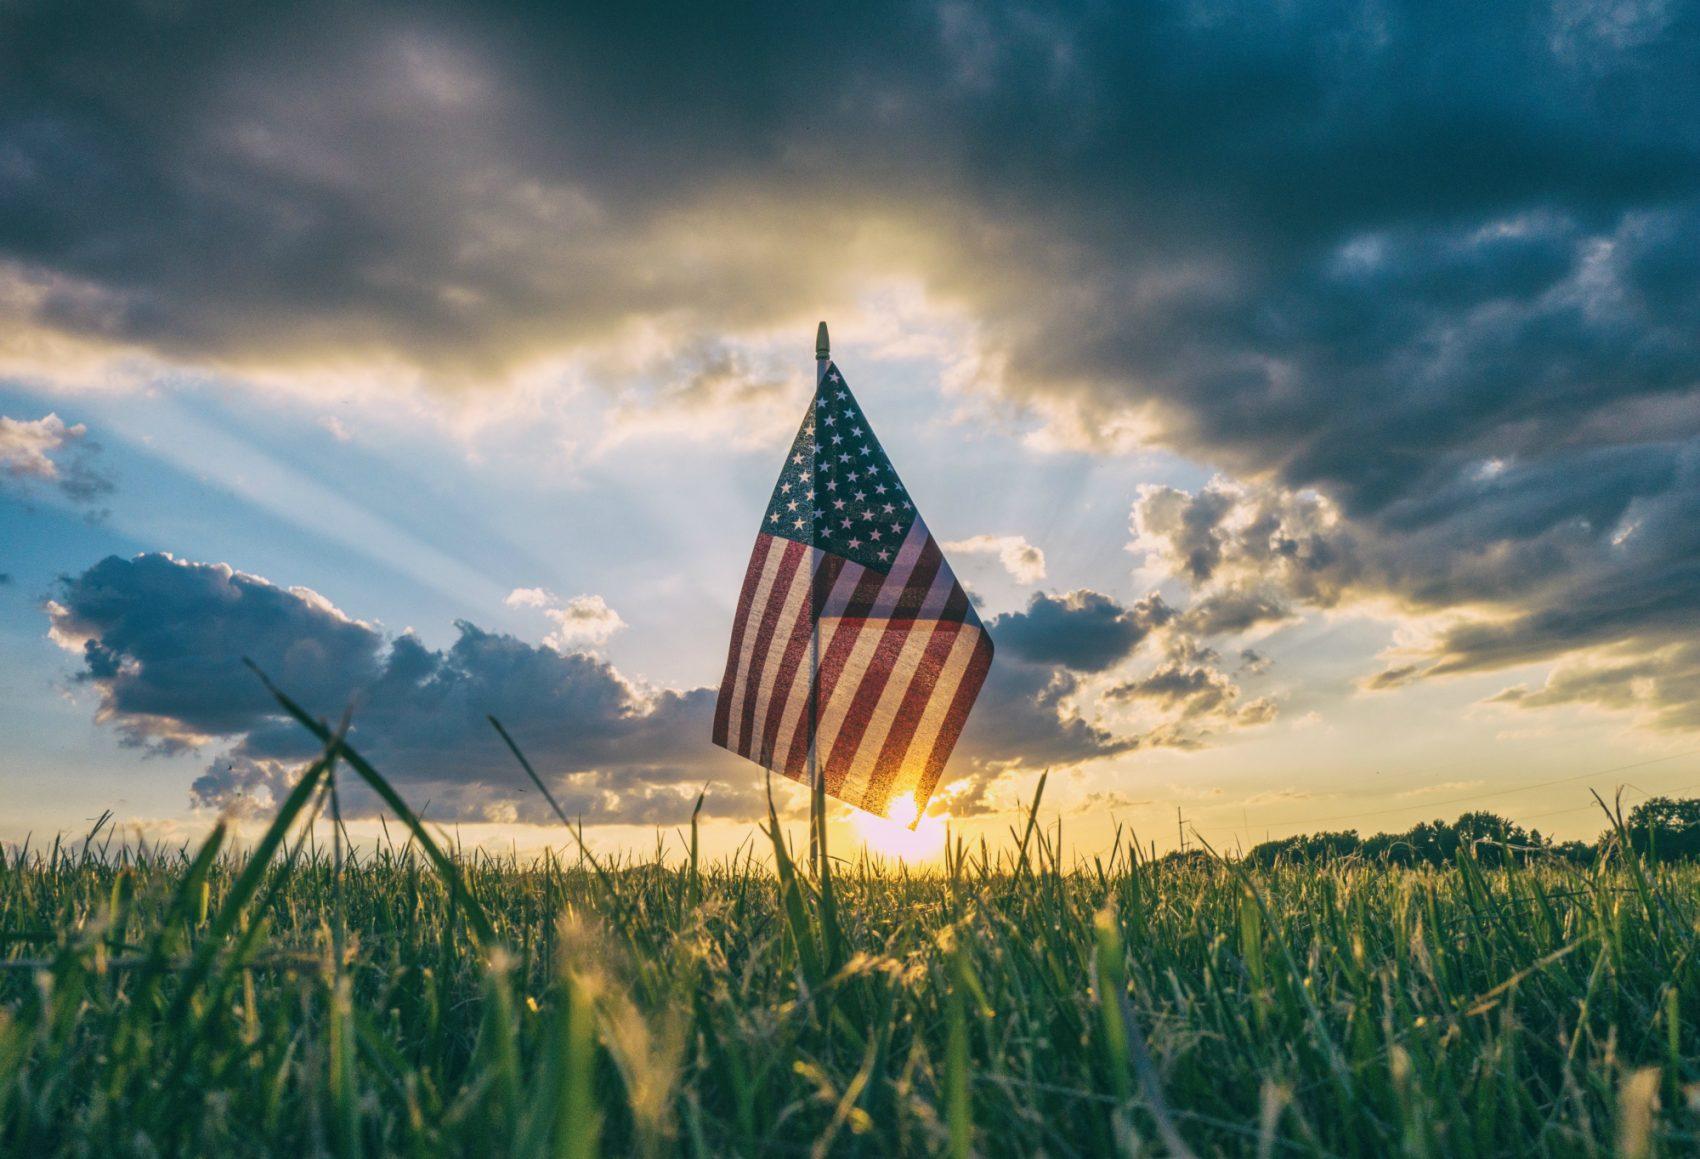 We can't expect environmental leadership, writes Nathaniel Stinnett, when so few voters demand it. (Aaron Burden/Unsplash)